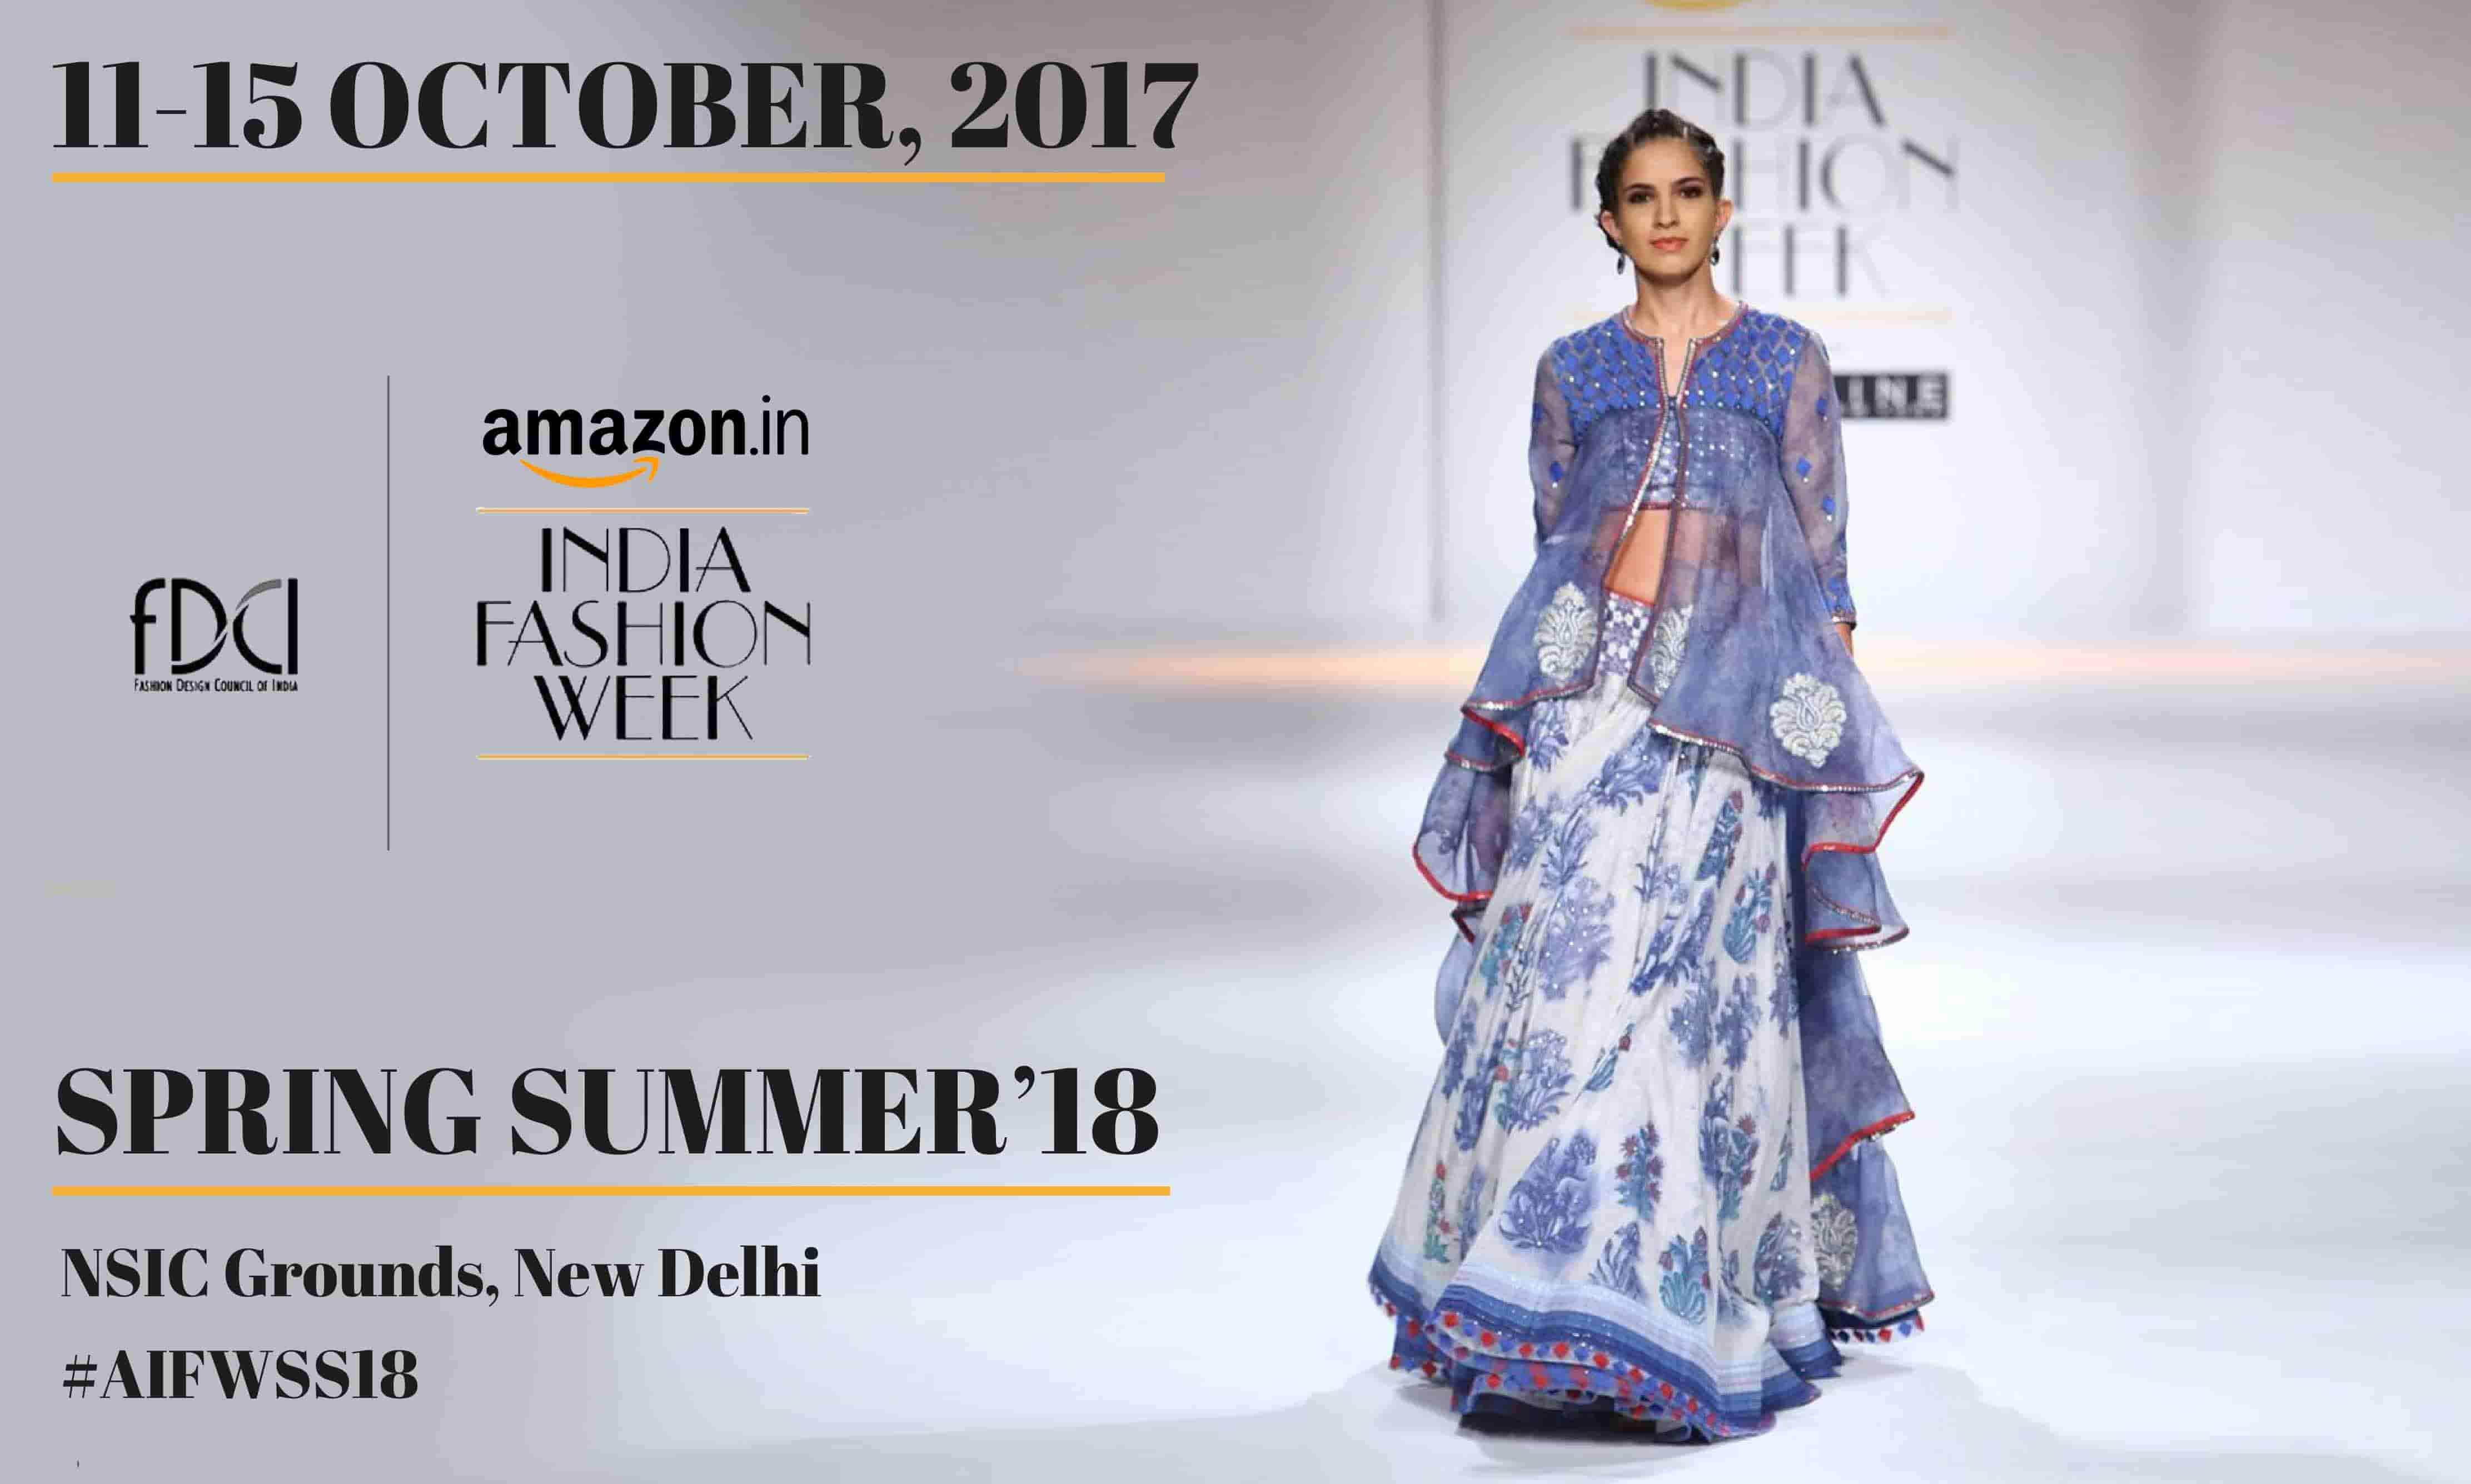 956e3cd0e أسبوع أمازون الهند للموضة | Fashion Business Services